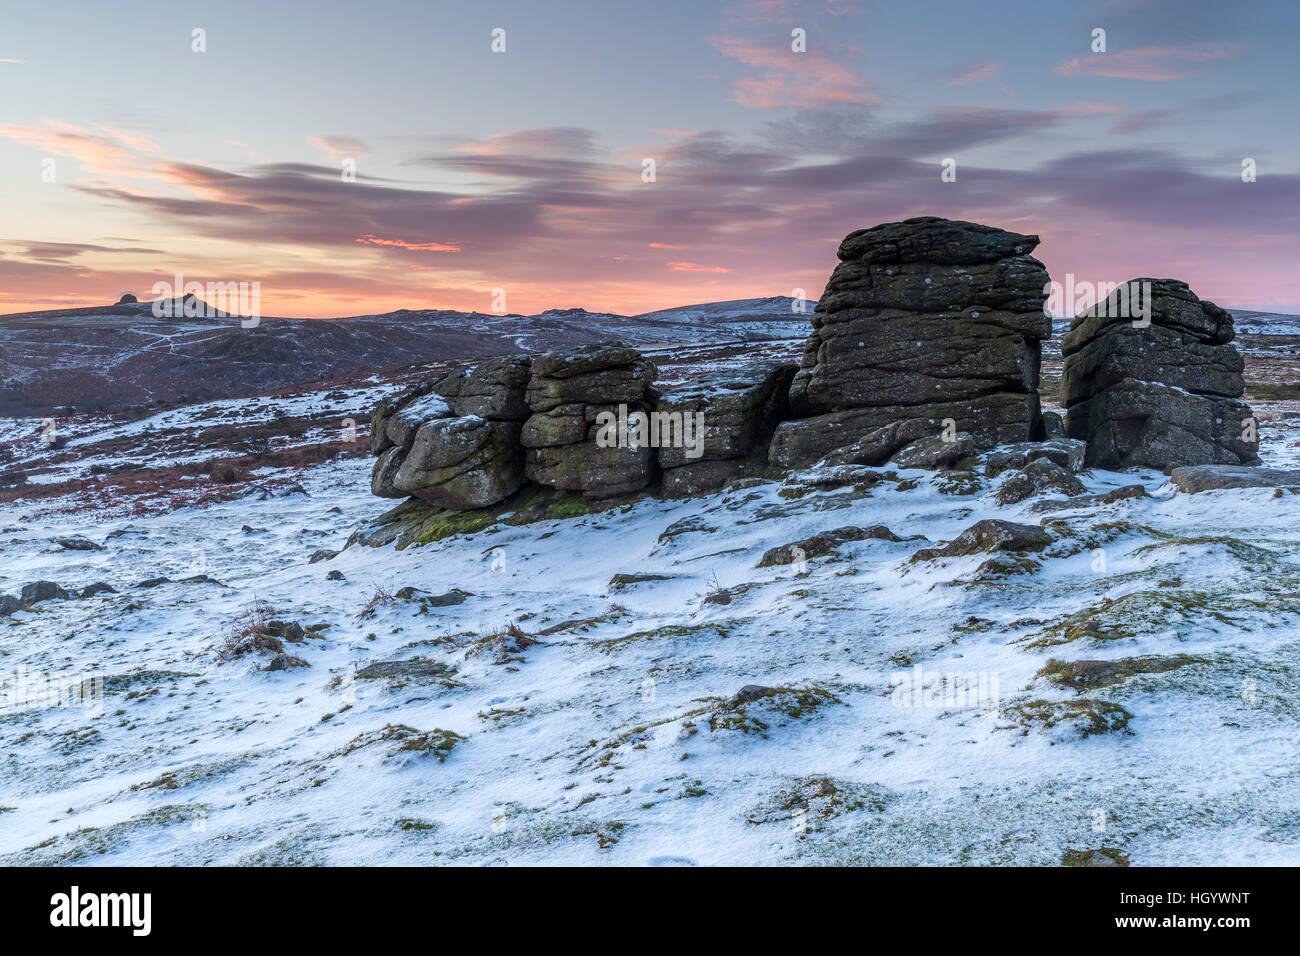 Devon, England. 14th Jan, 2017. Dartmoor seen from Hound Tor near Manaton. © Sebastian Wasek/Alamy Live News - Stock Image